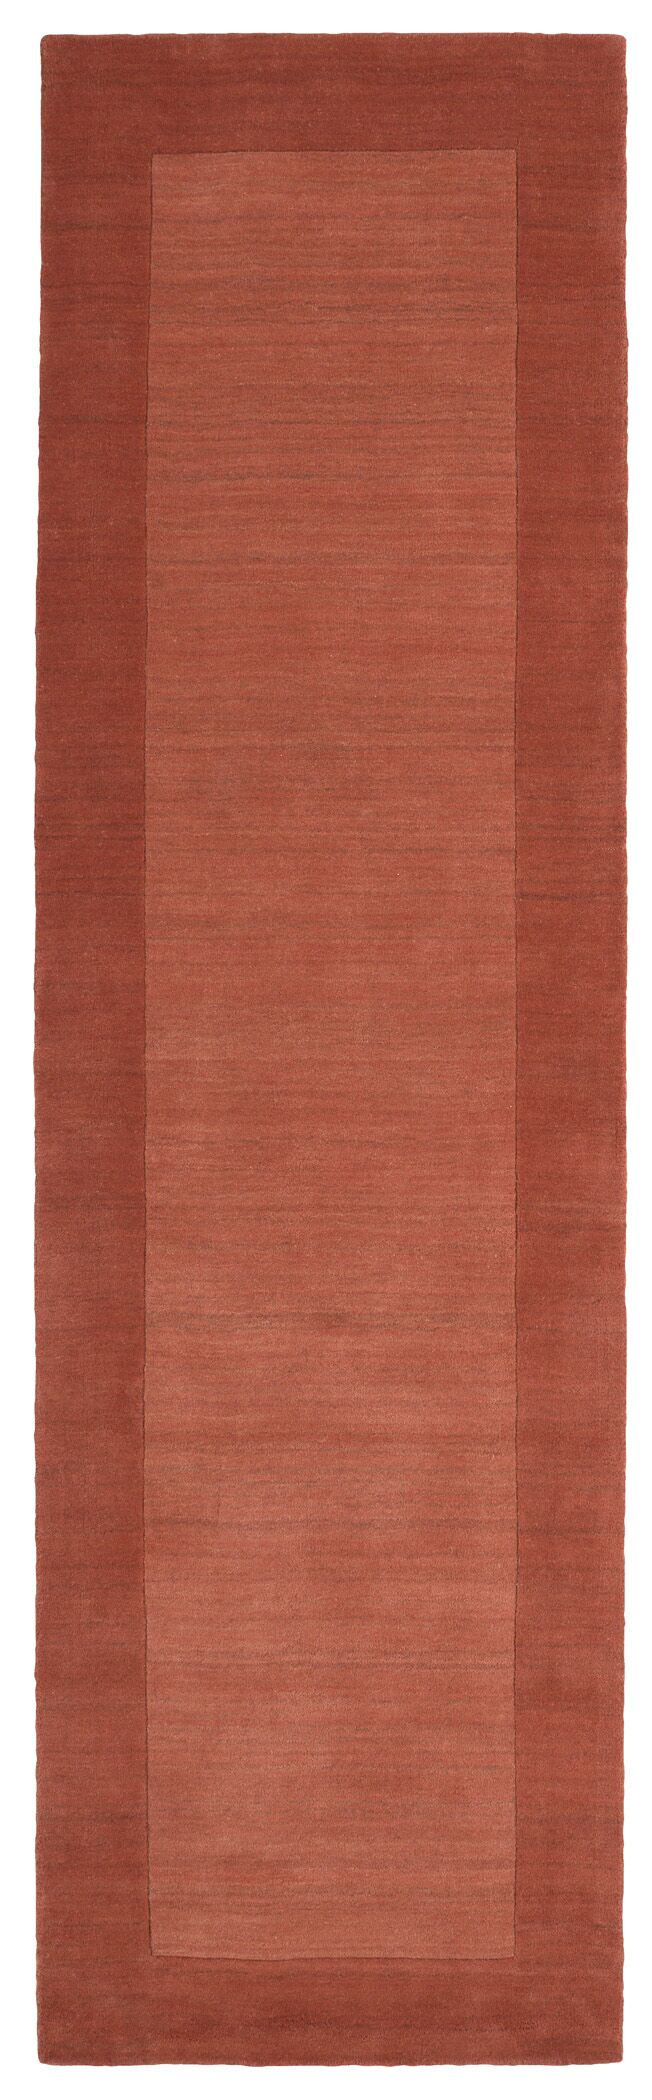 Barnard Hand Tufted Brown Area Rug Rug Size: Runner 2'6